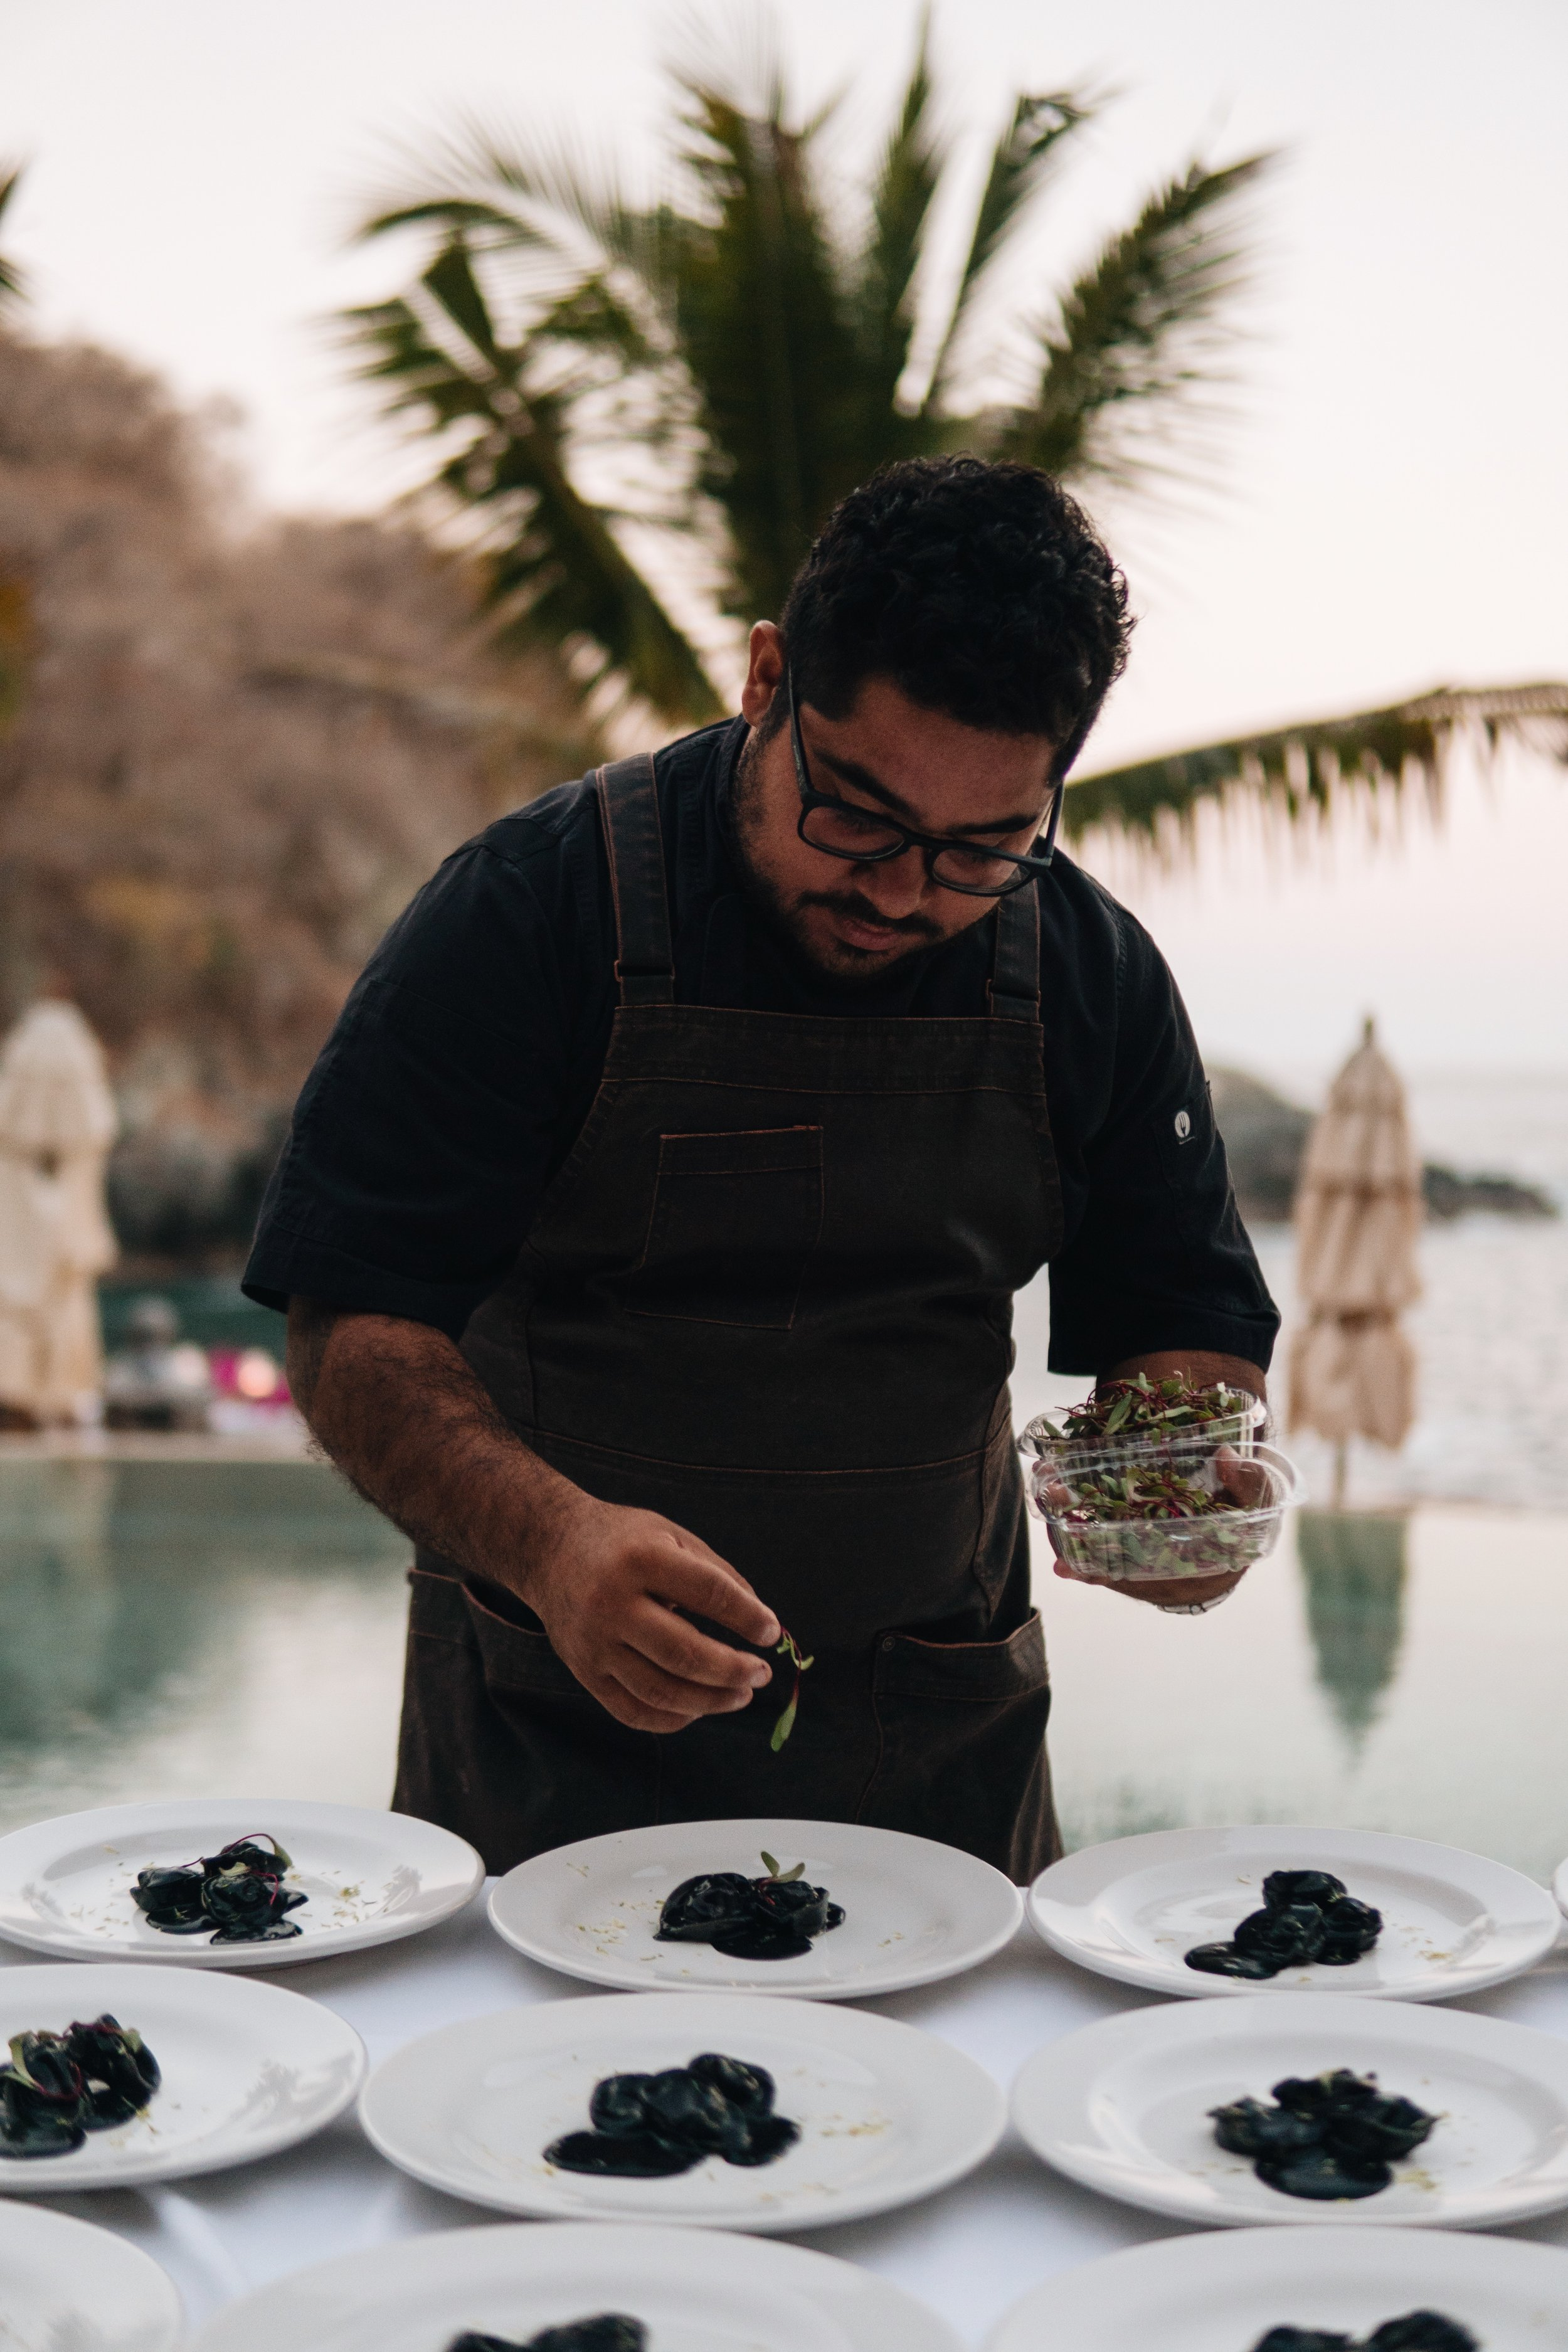 Clandestina-Punta-Garrobo-Ixtapa-Zihuatanejo-Angustina-Chef-Felipe-Meneses-Fotografía-Heiko-Bothe-11.JPG